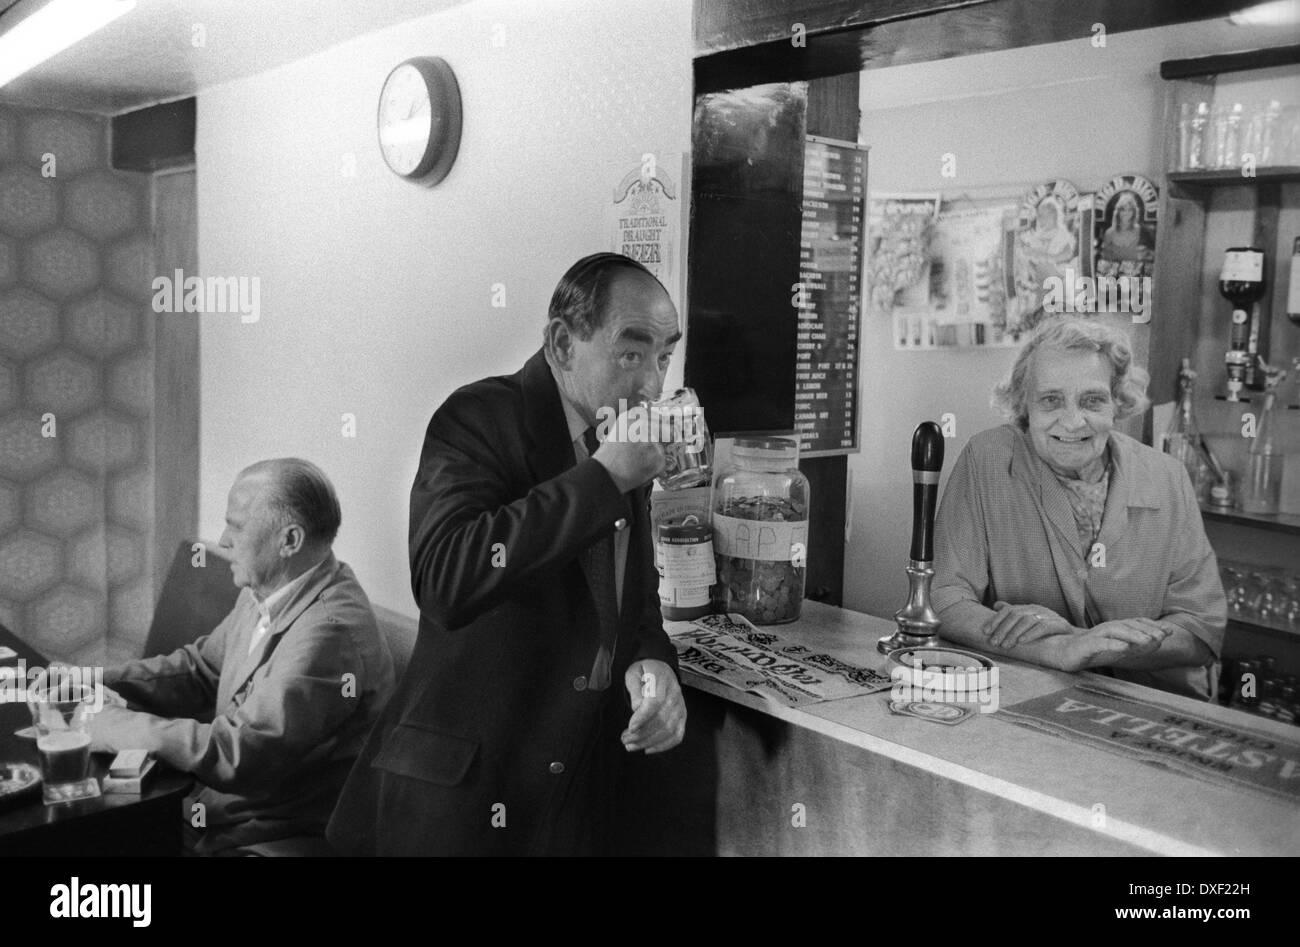 Pub interior 1970s Shropshire village life Landlady and customer at the bar. England 70s UK HOMER SYKES - Stock Image